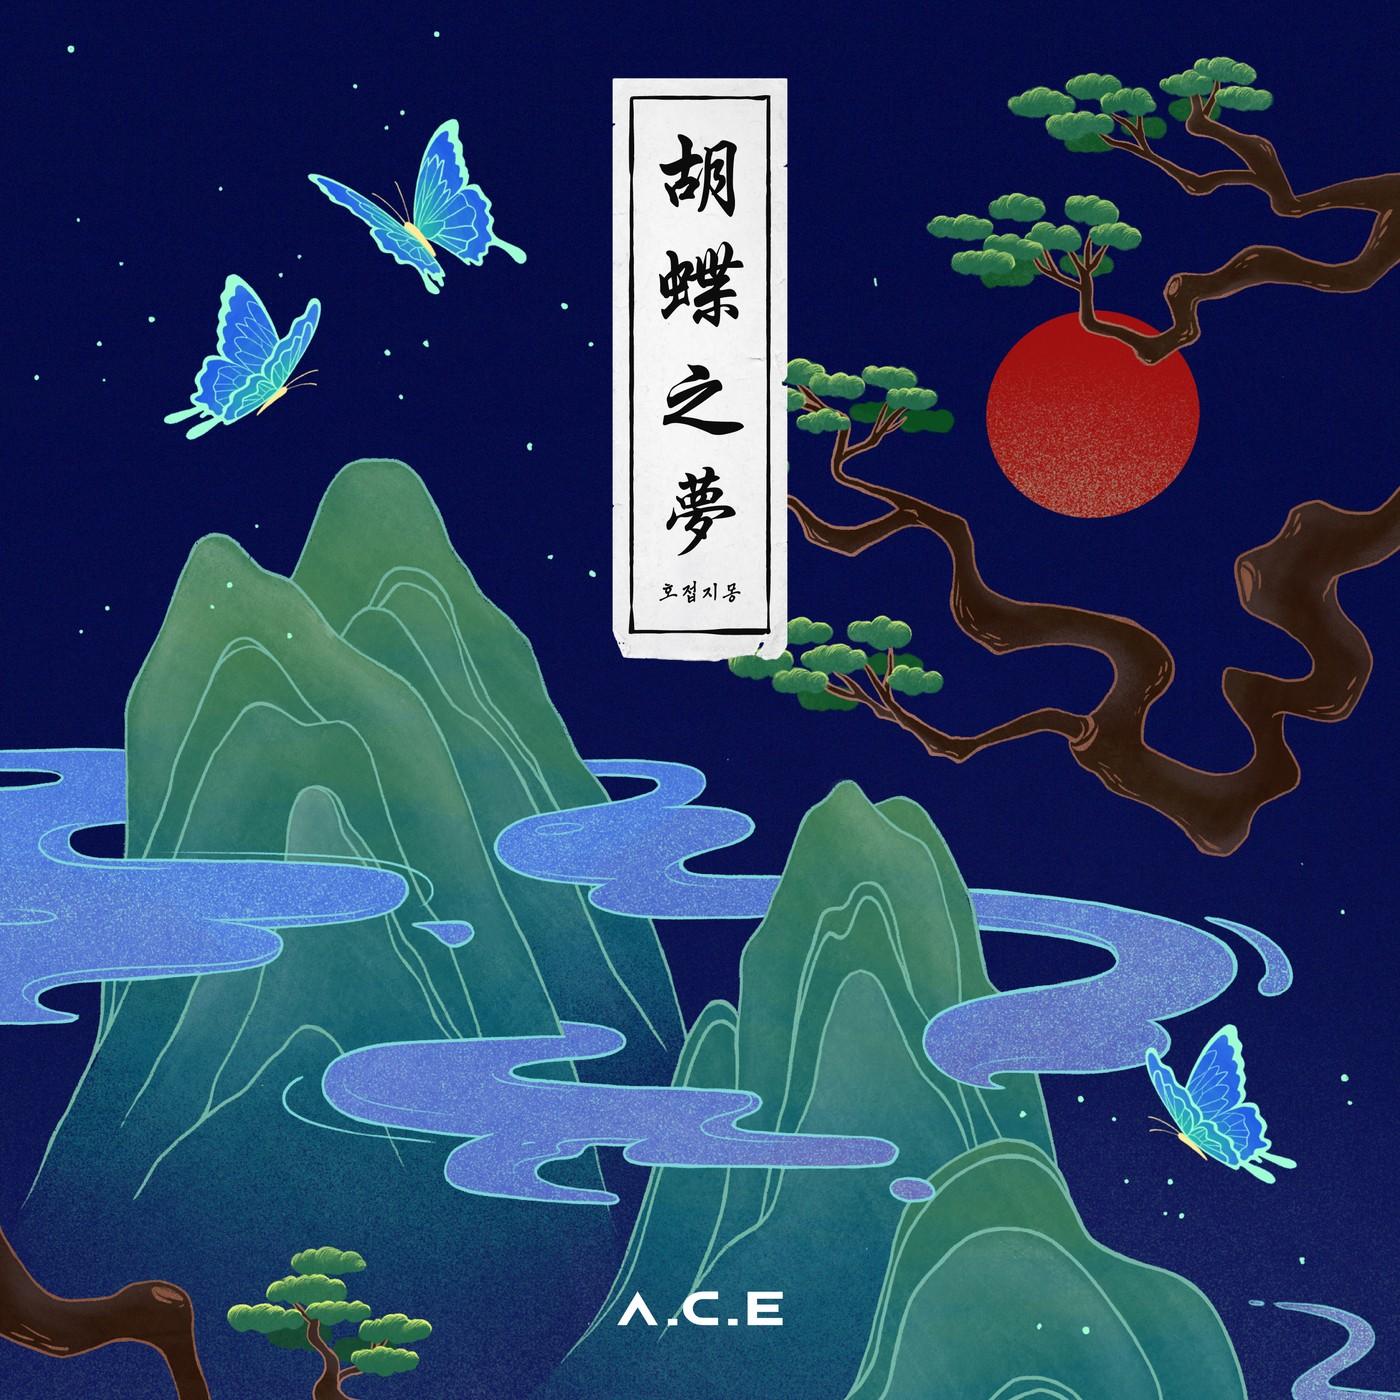 A.C.E – HJZM : The Butterfly Phantasy [FLAC + MP3 320] [2020.09.02]